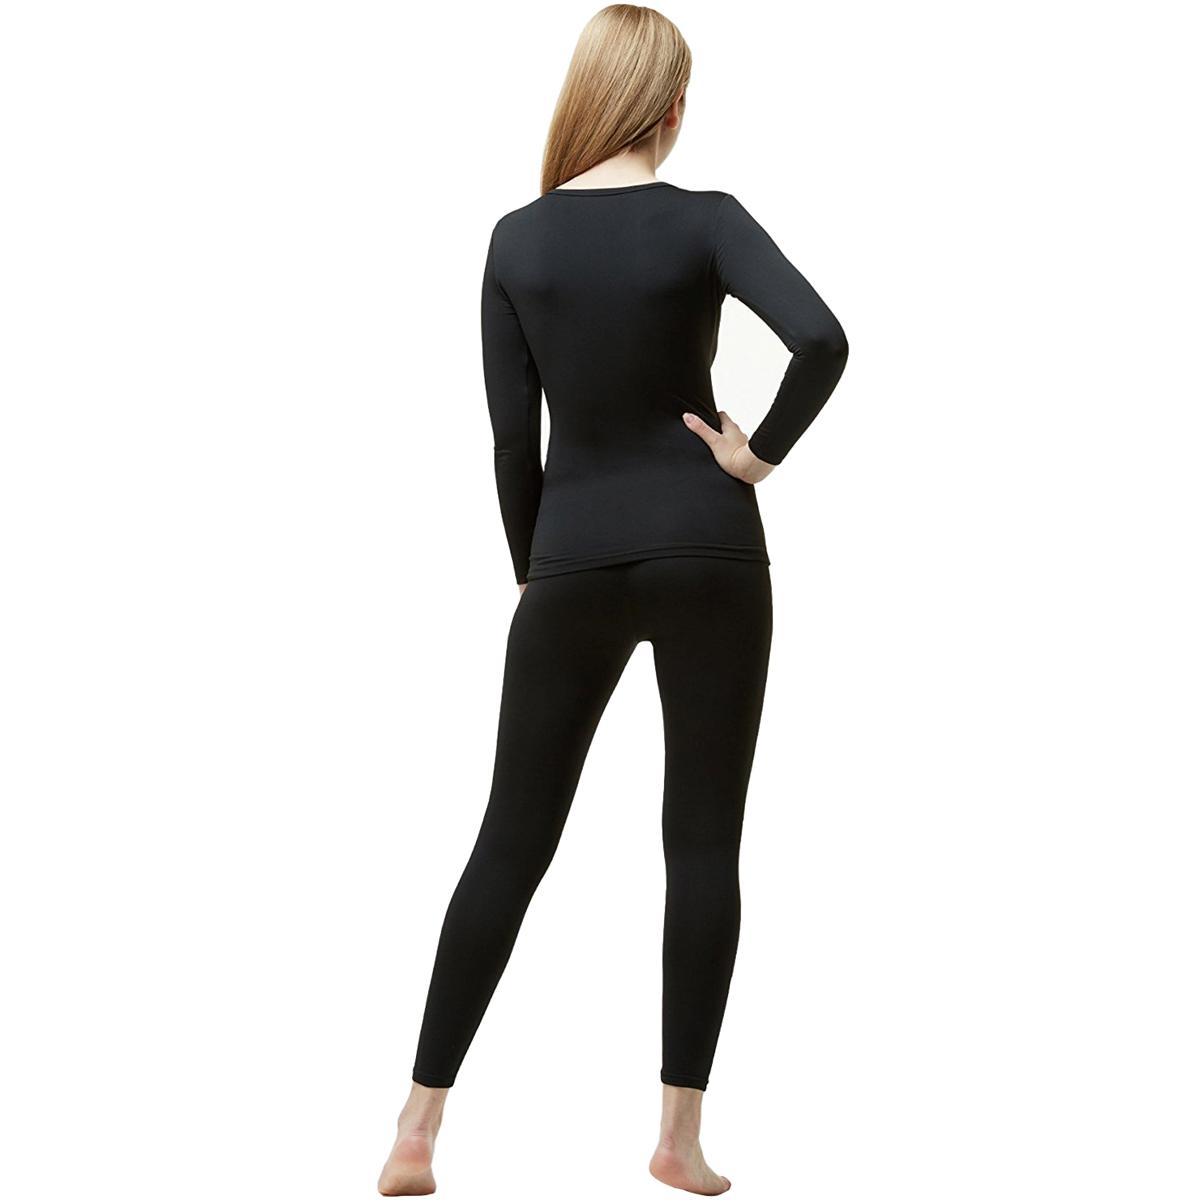 Tesla Blank WHS200 Women/'s Microfiber Fleece Lined Top and Bottom Set